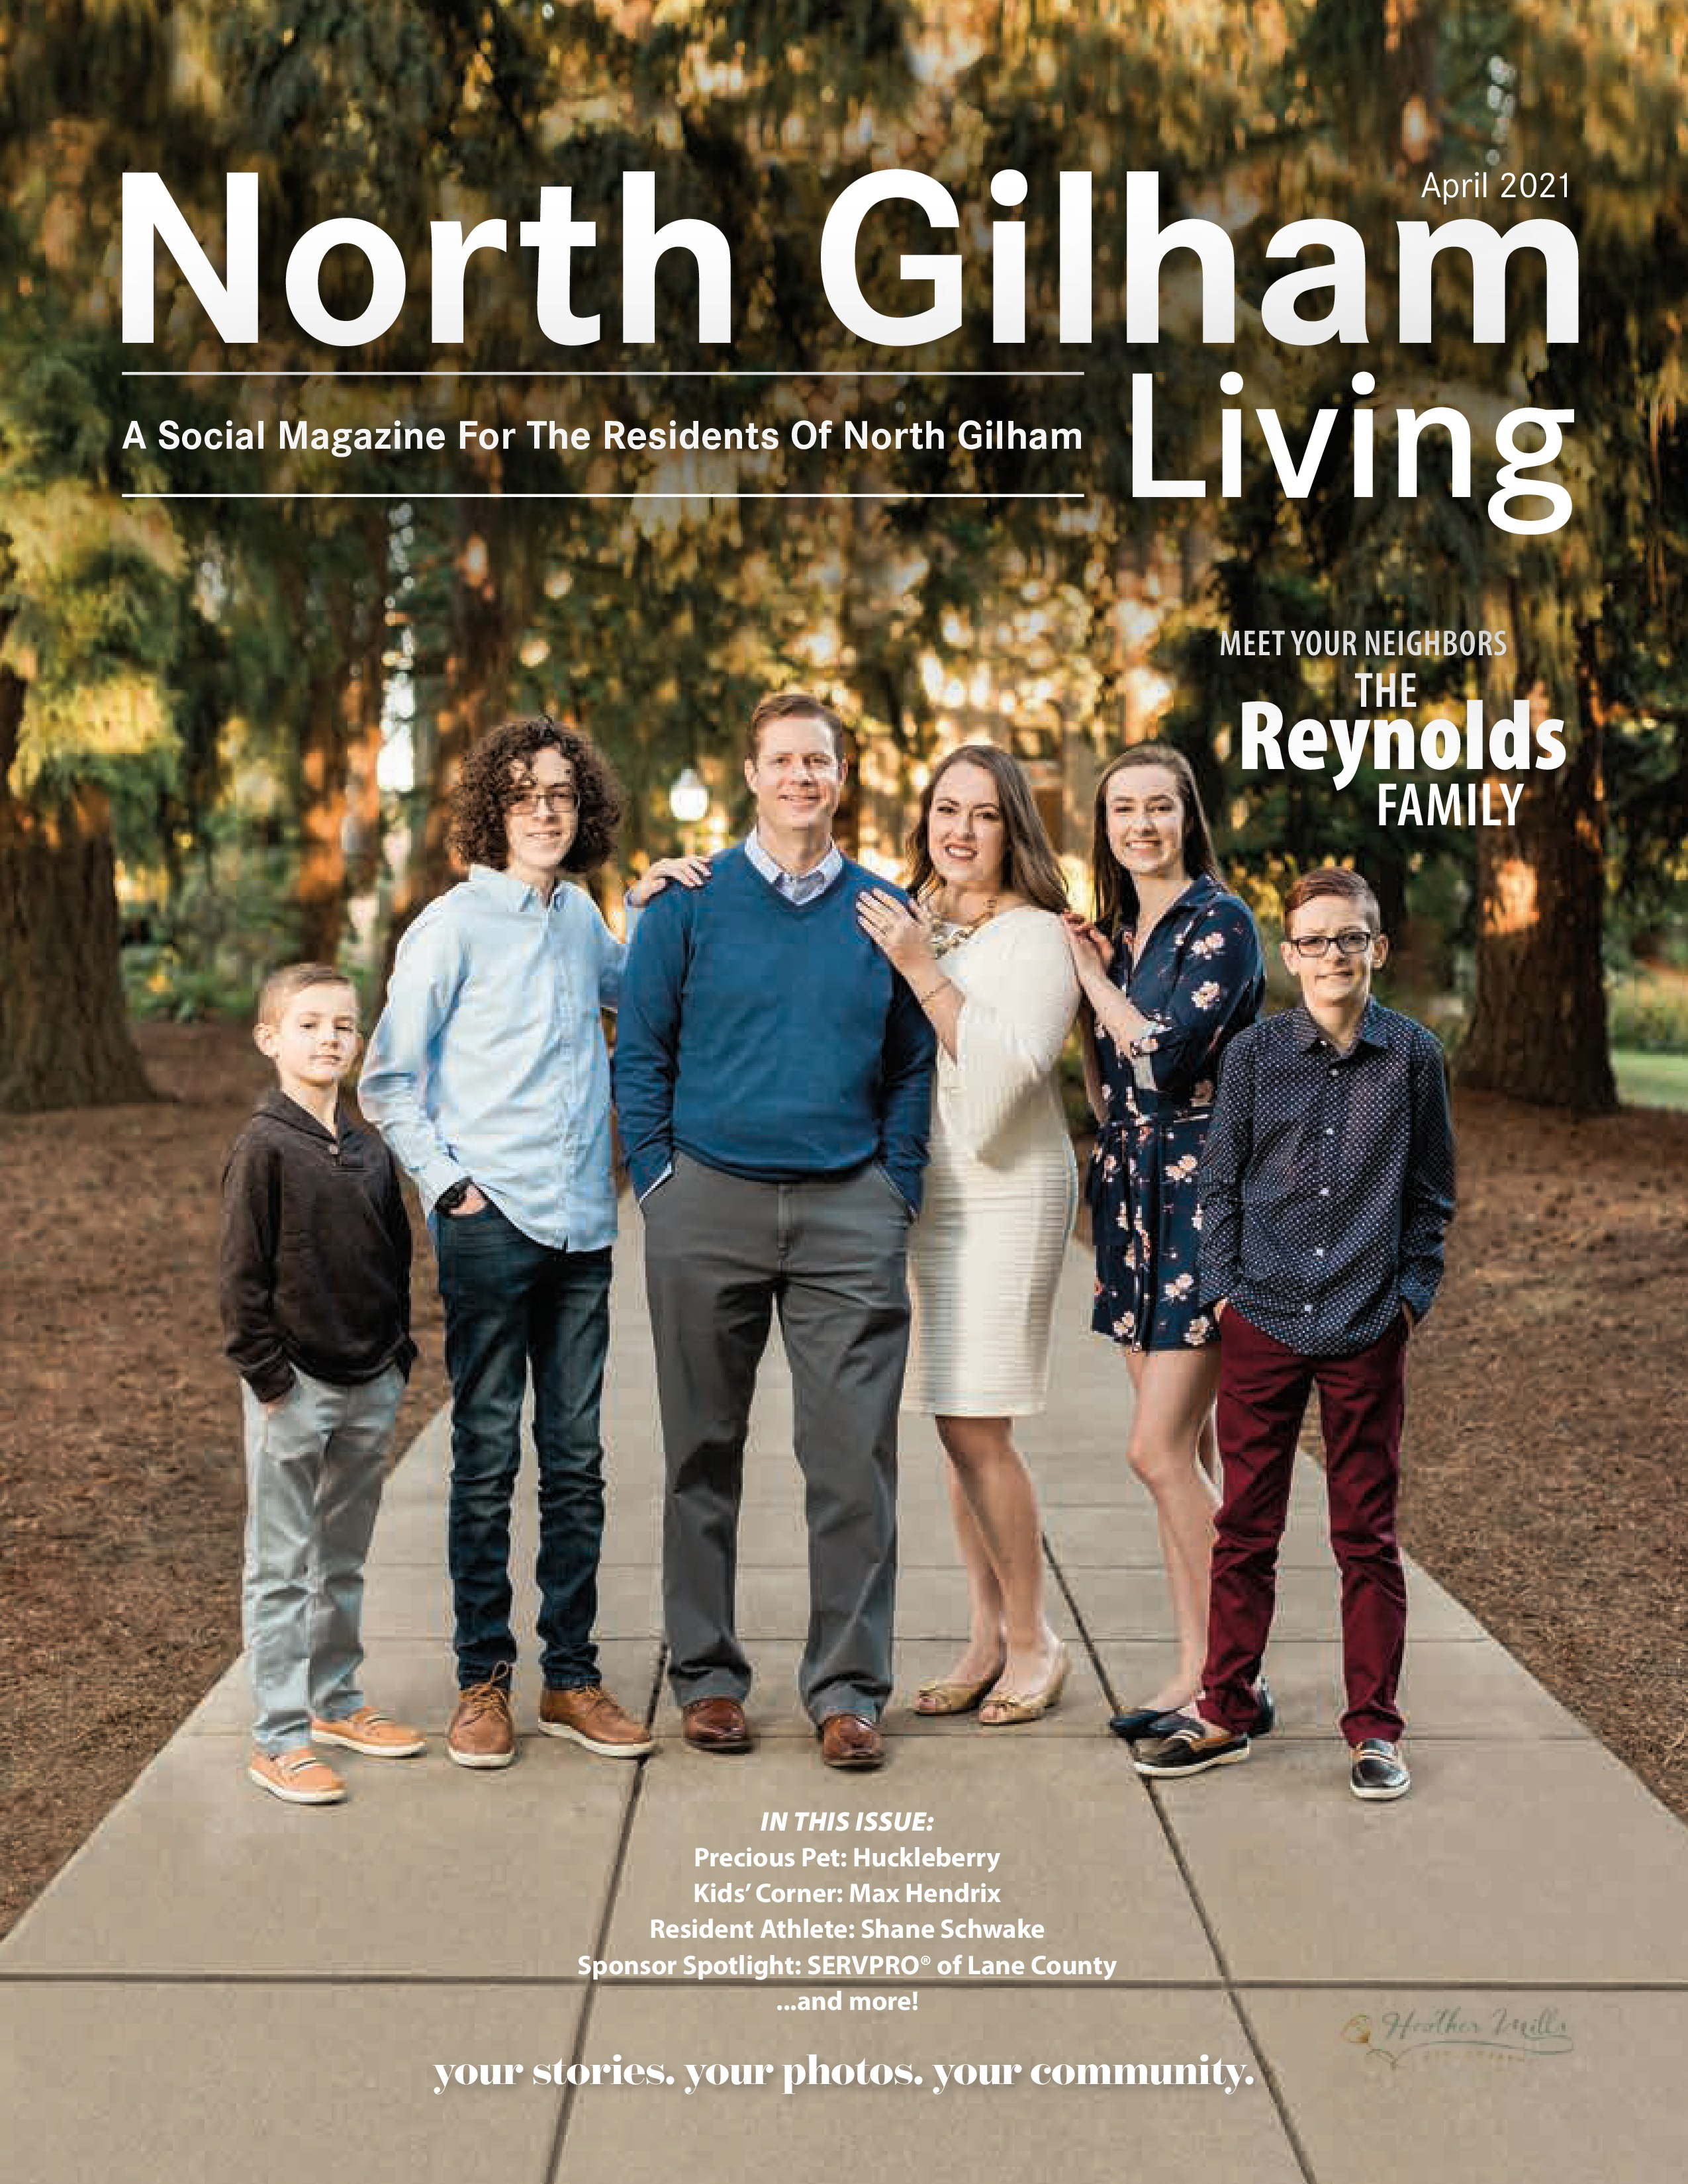 North Gilham Living 2021-04-01